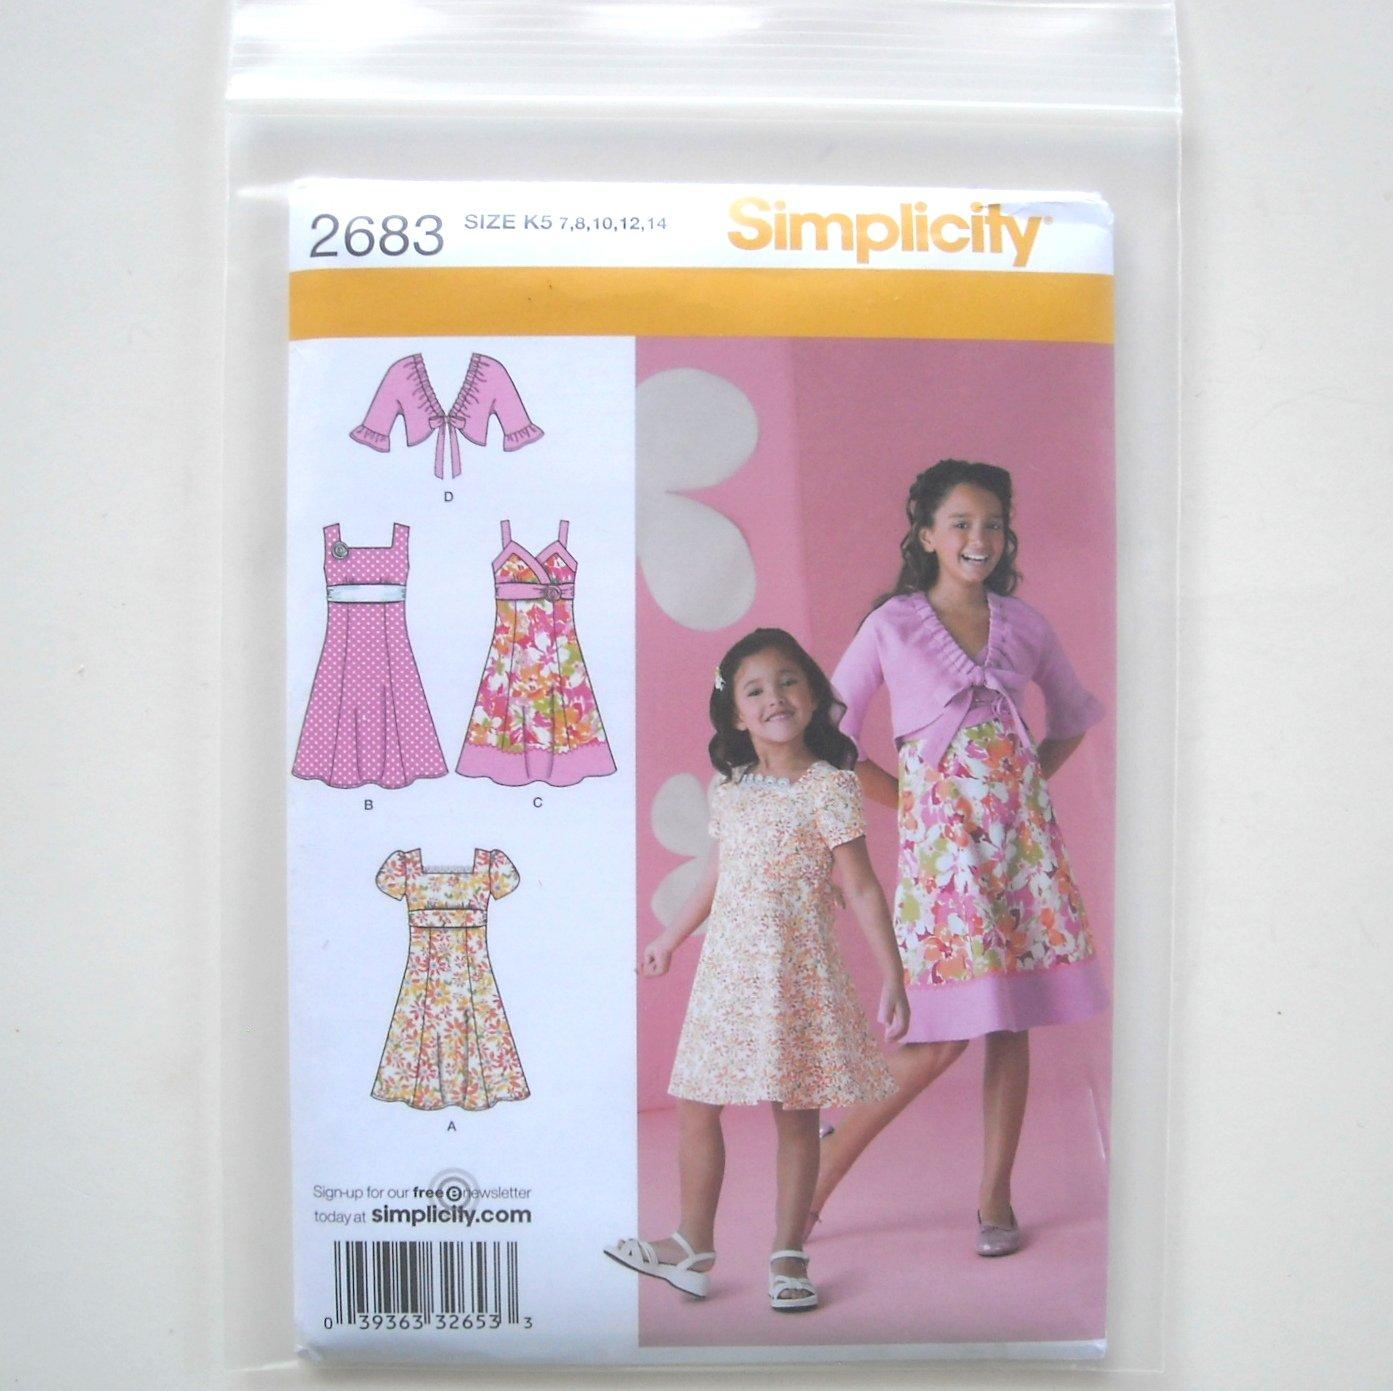 Simplicity Pattern 2683 Size 7 - 14 Child Girl Dresses Jacket